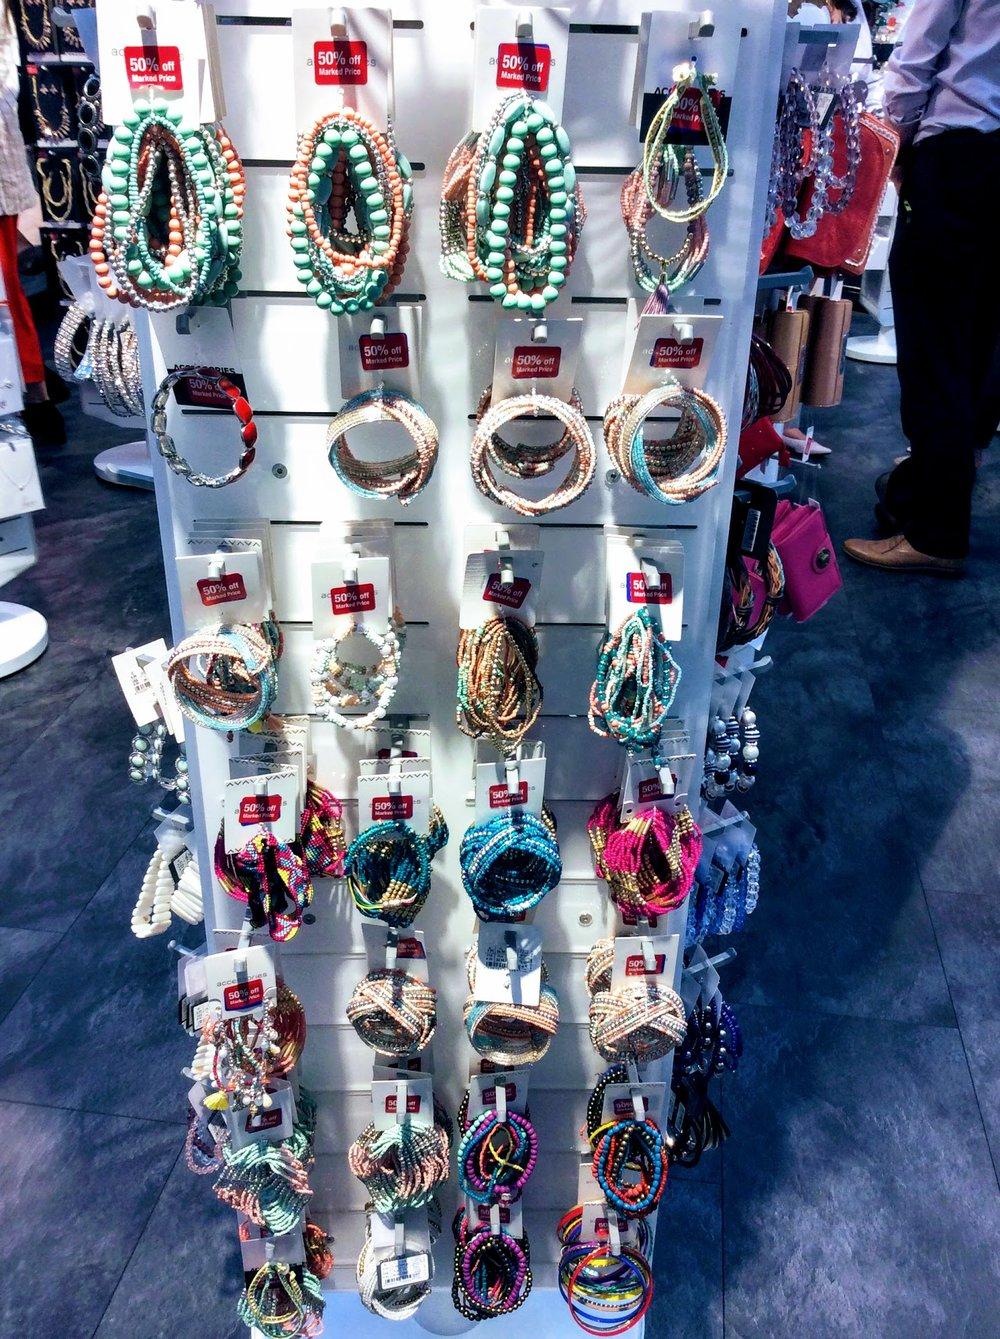 An abundance of embellished treats await you at SIX4GOOD.